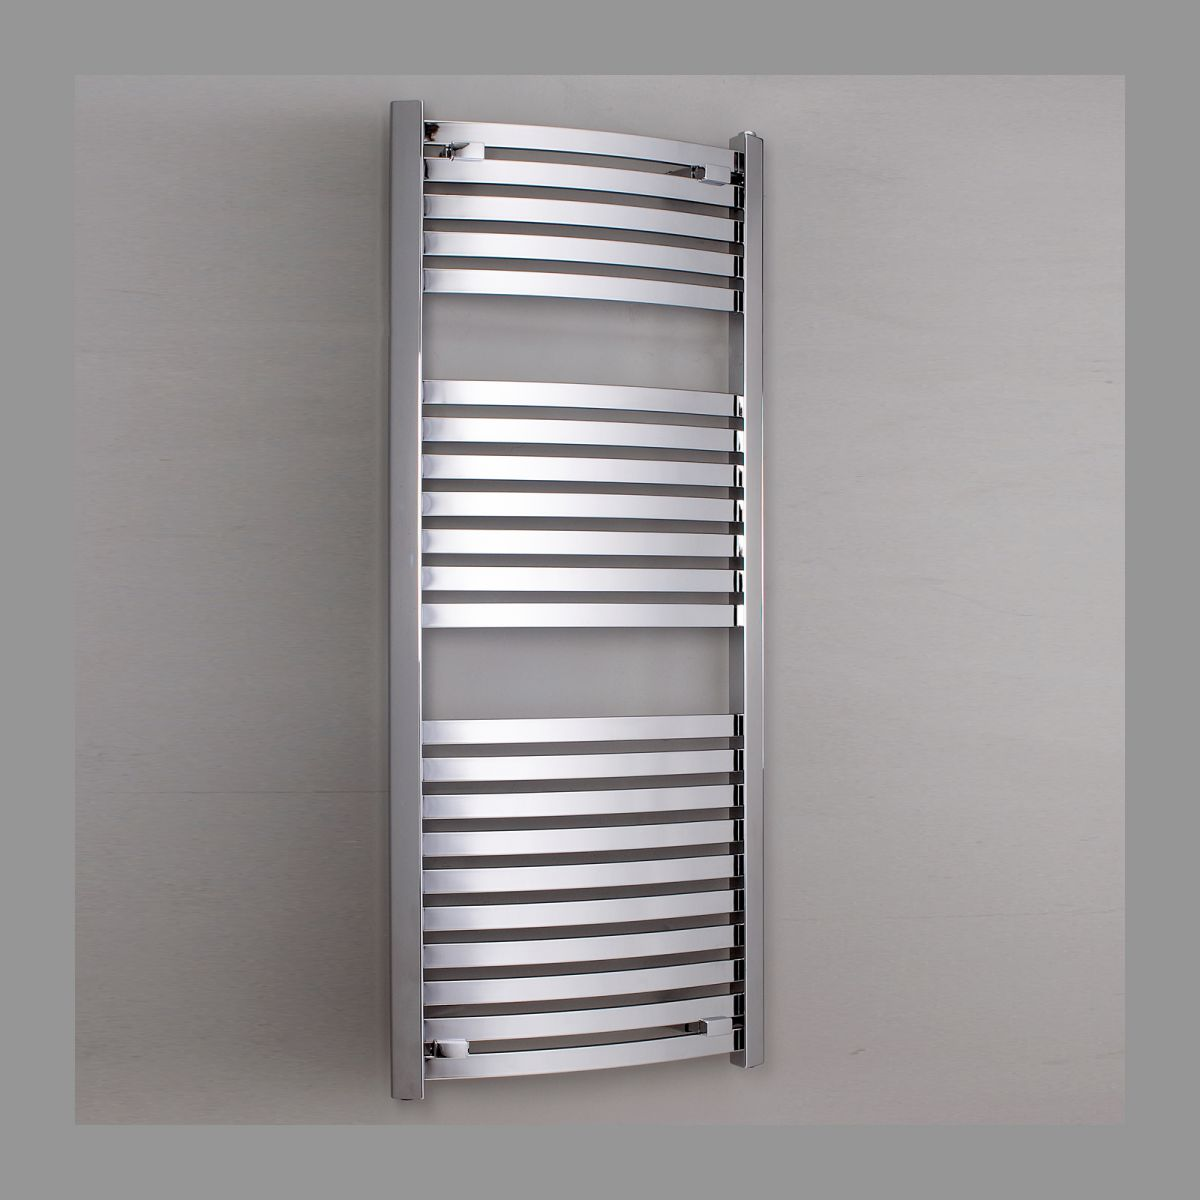 phoenix rochelle chrome curved radiator uk bathrooms. Black Bedroom Furniture Sets. Home Design Ideas